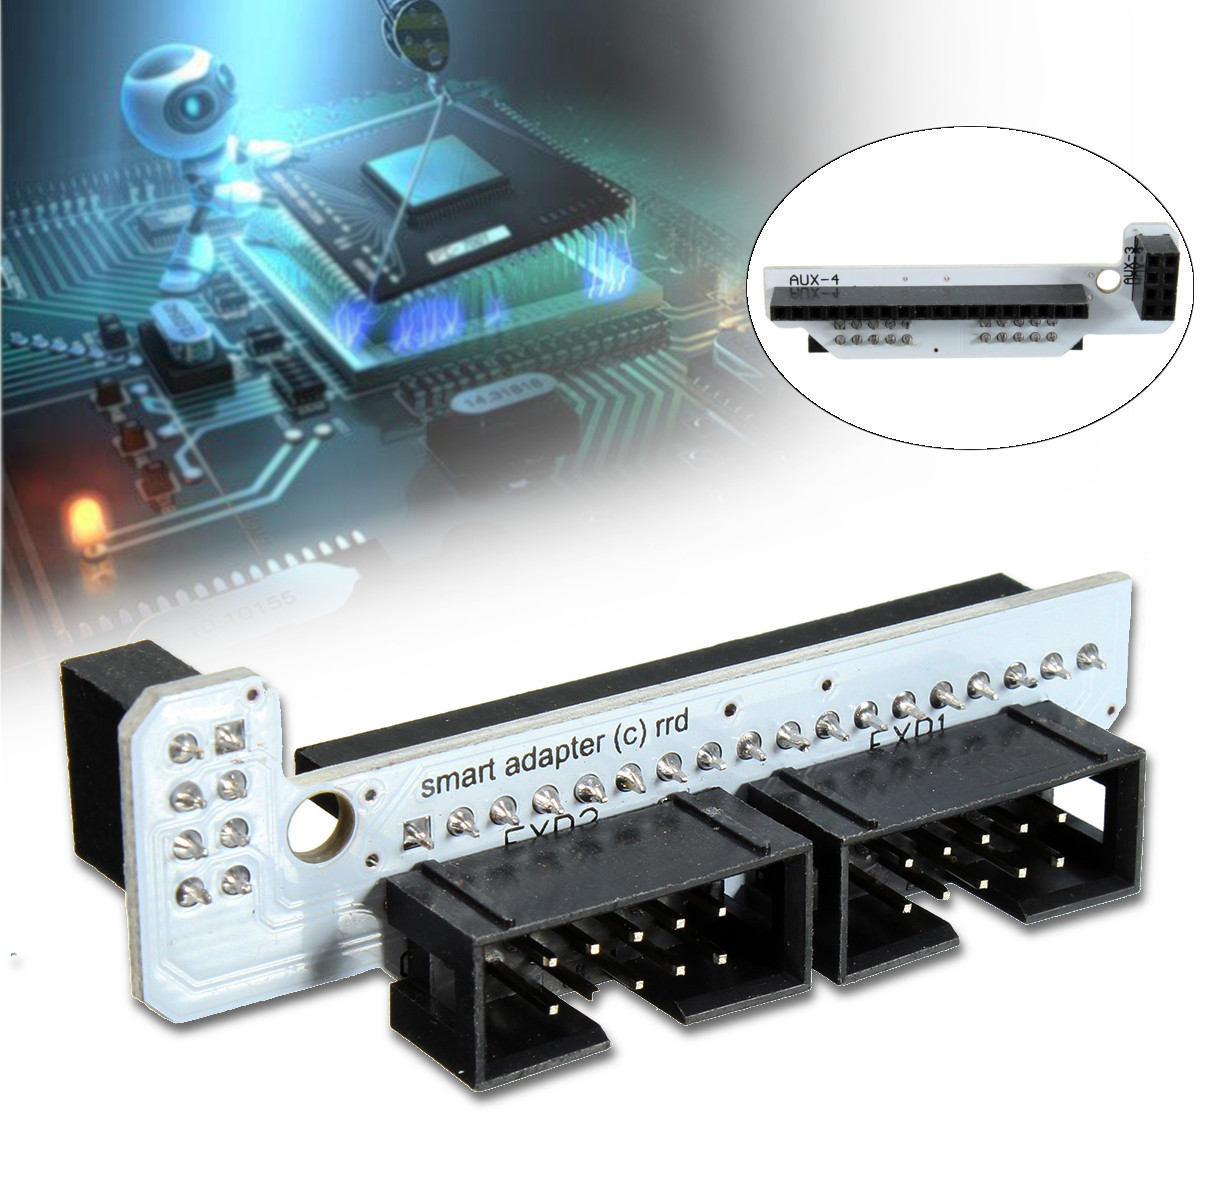 3D Printer Smart Controller Adapter for Ramps 1.4 Shield LCD 3D Printer Accessories 2004 Module &12864